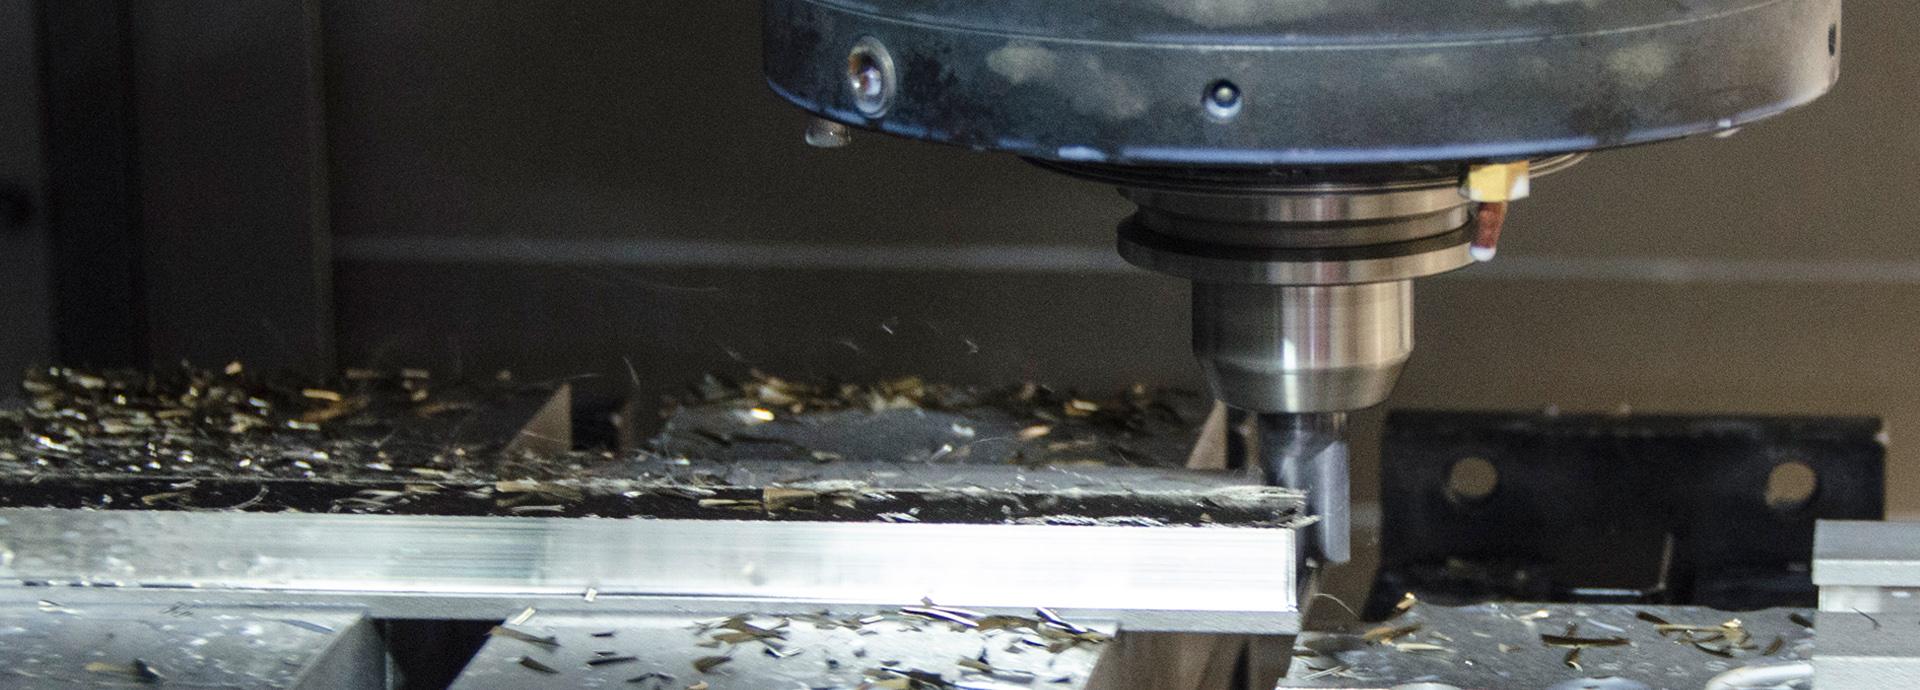 CNC Milling | Horschel Brothers Precision - Springville, New York